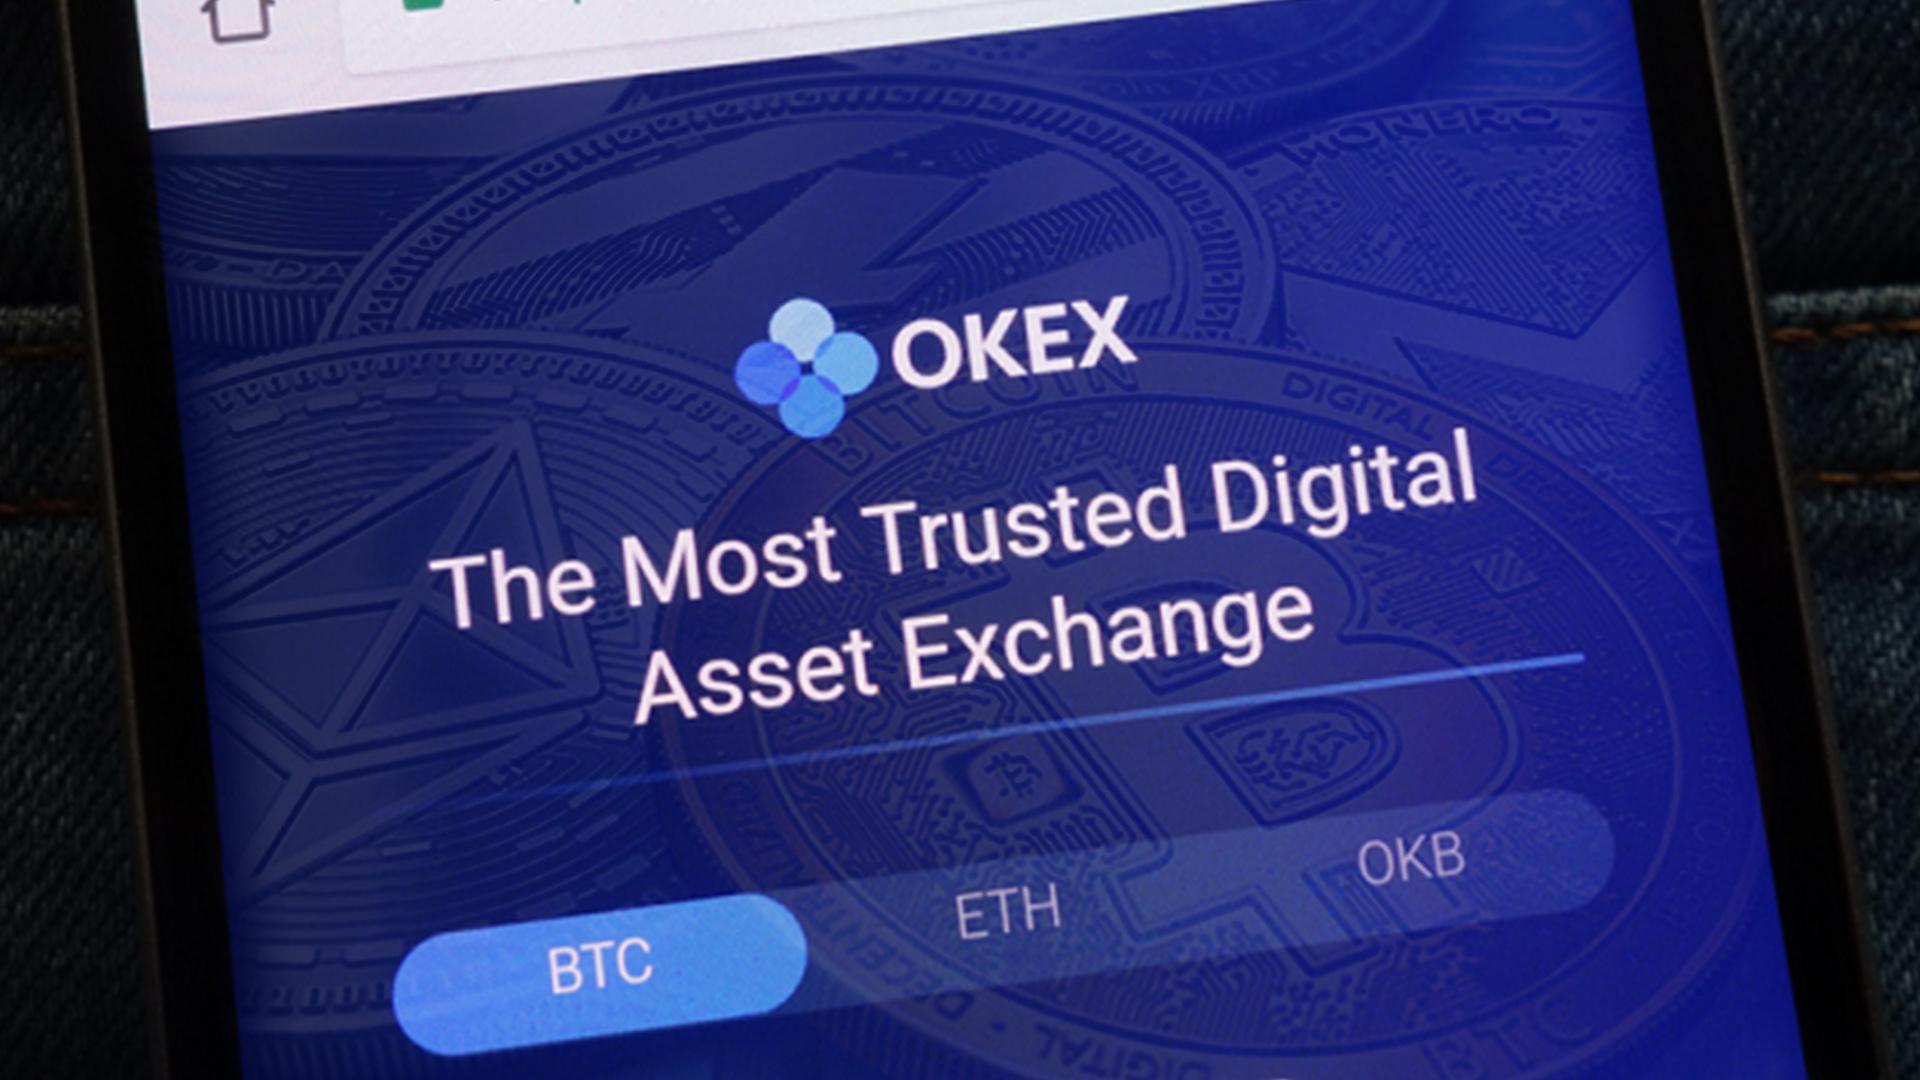 OKEx se asocia con Settle Network para permitir compras de Bitcoin y Ethereum con monedas locales de Argentina, Brasil y México